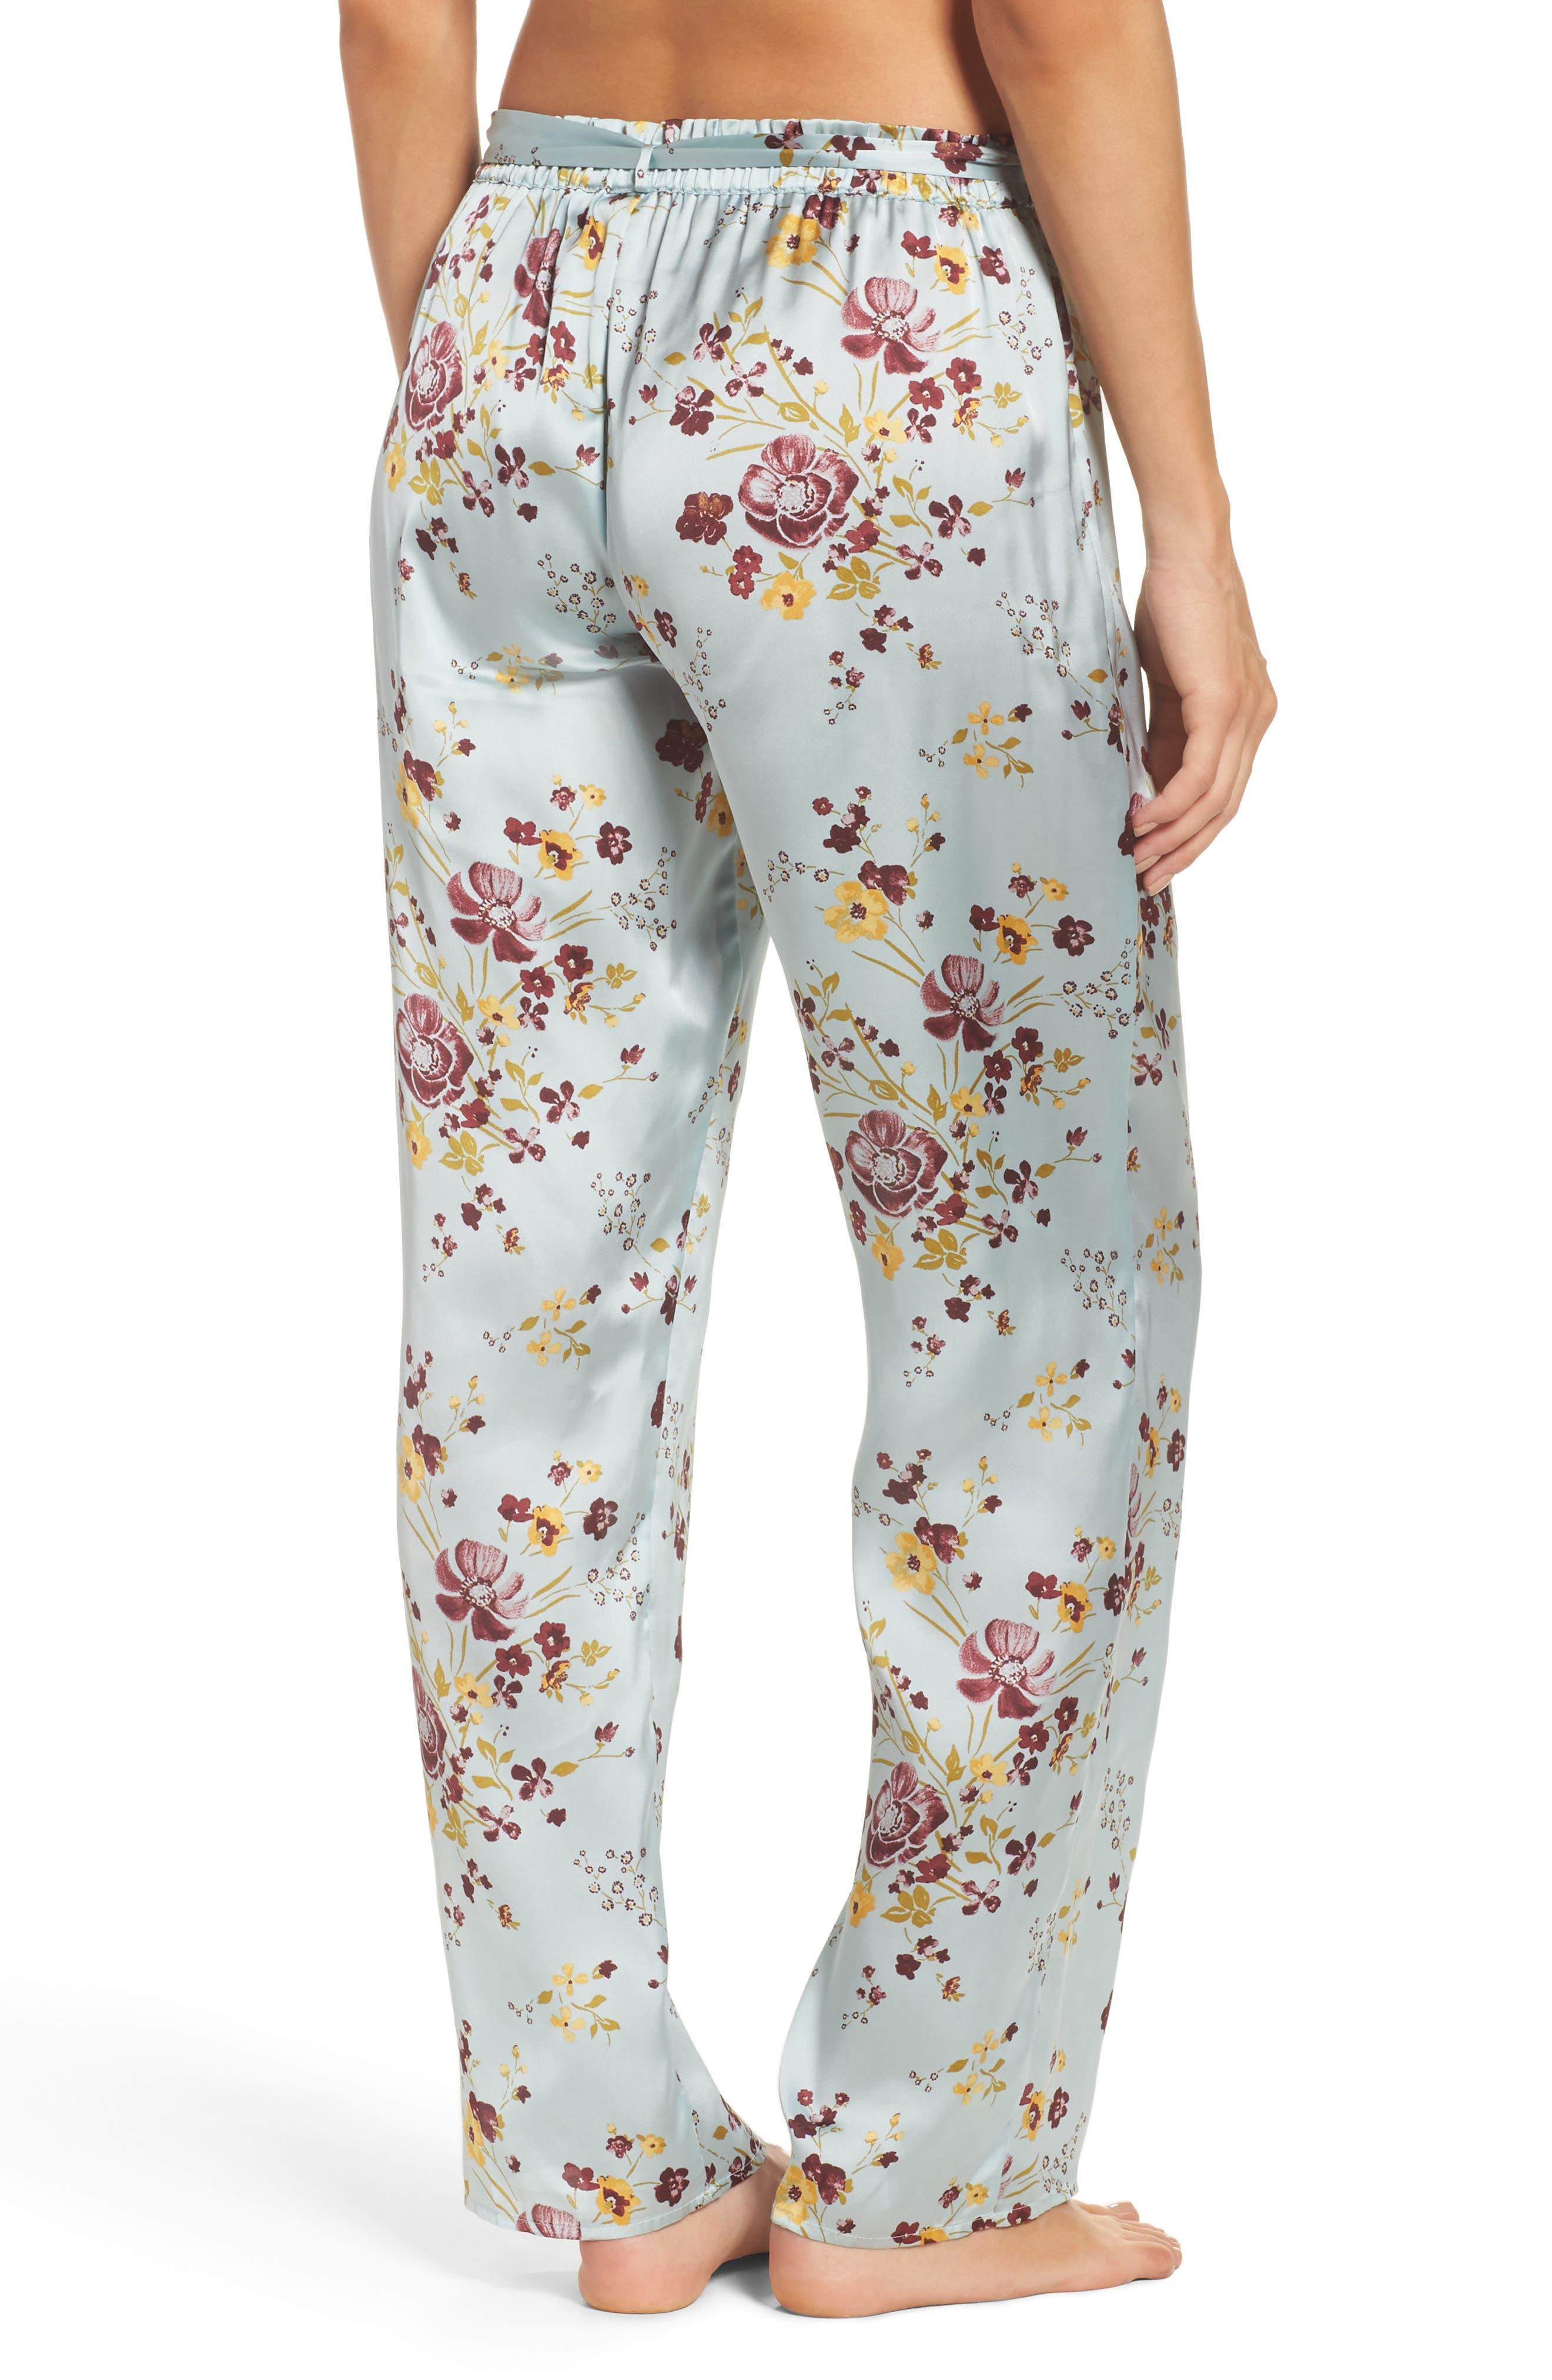 In My Dreams Pajama Pants,                             Alternate thumbnail 2, color,                             Blue Cloud Pretty Floral